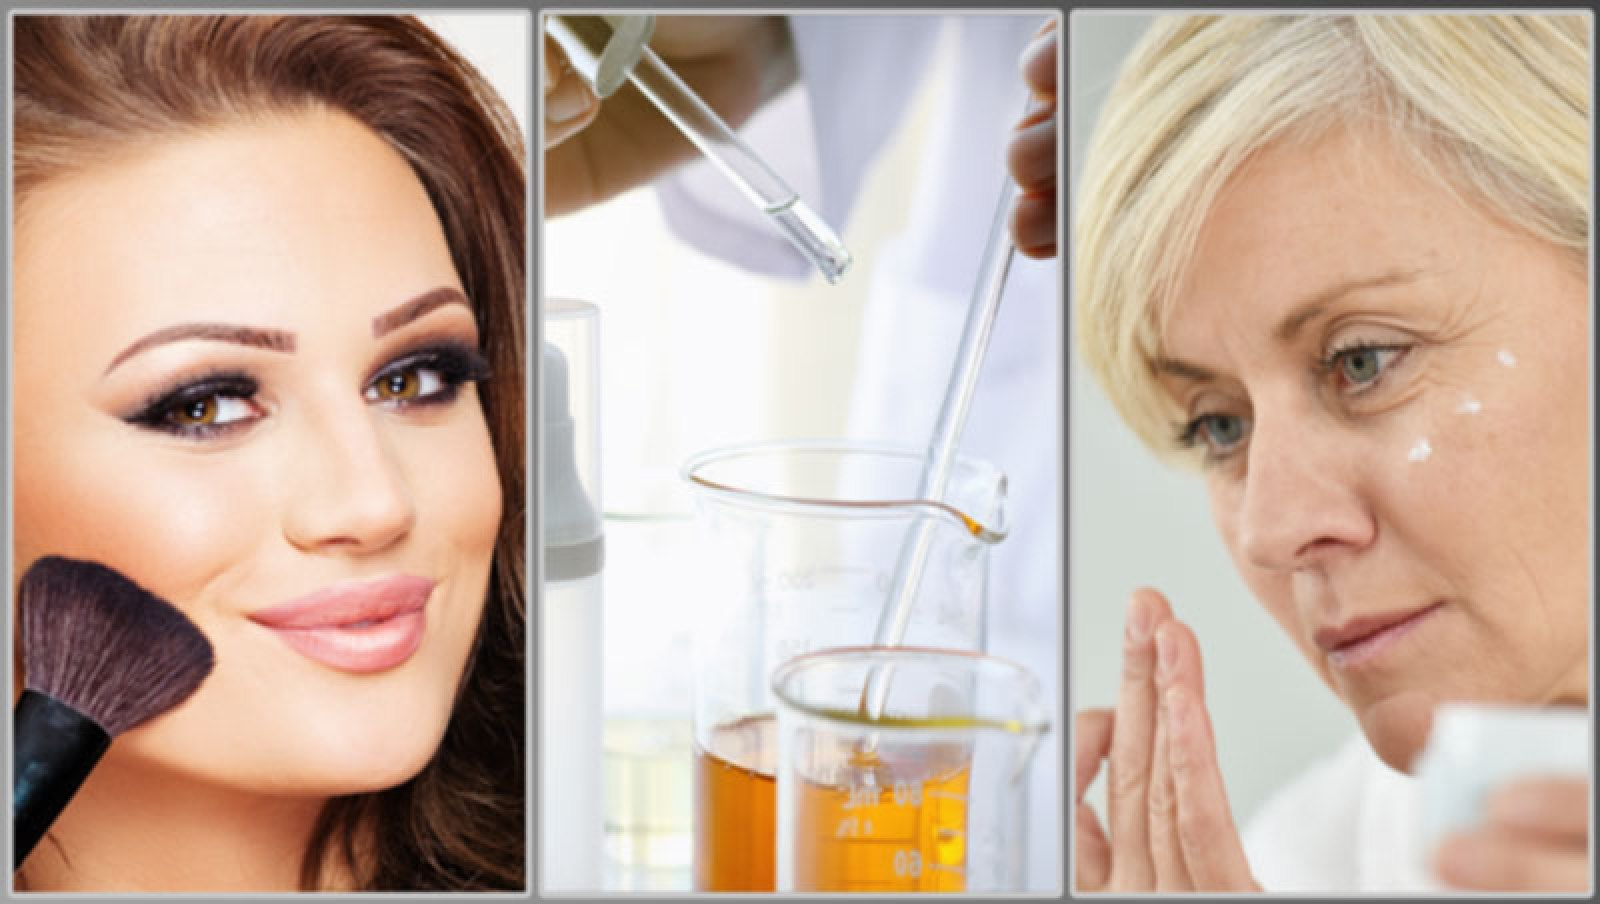 Advanced Skin Care - Makeup, Skin Care, Expertise